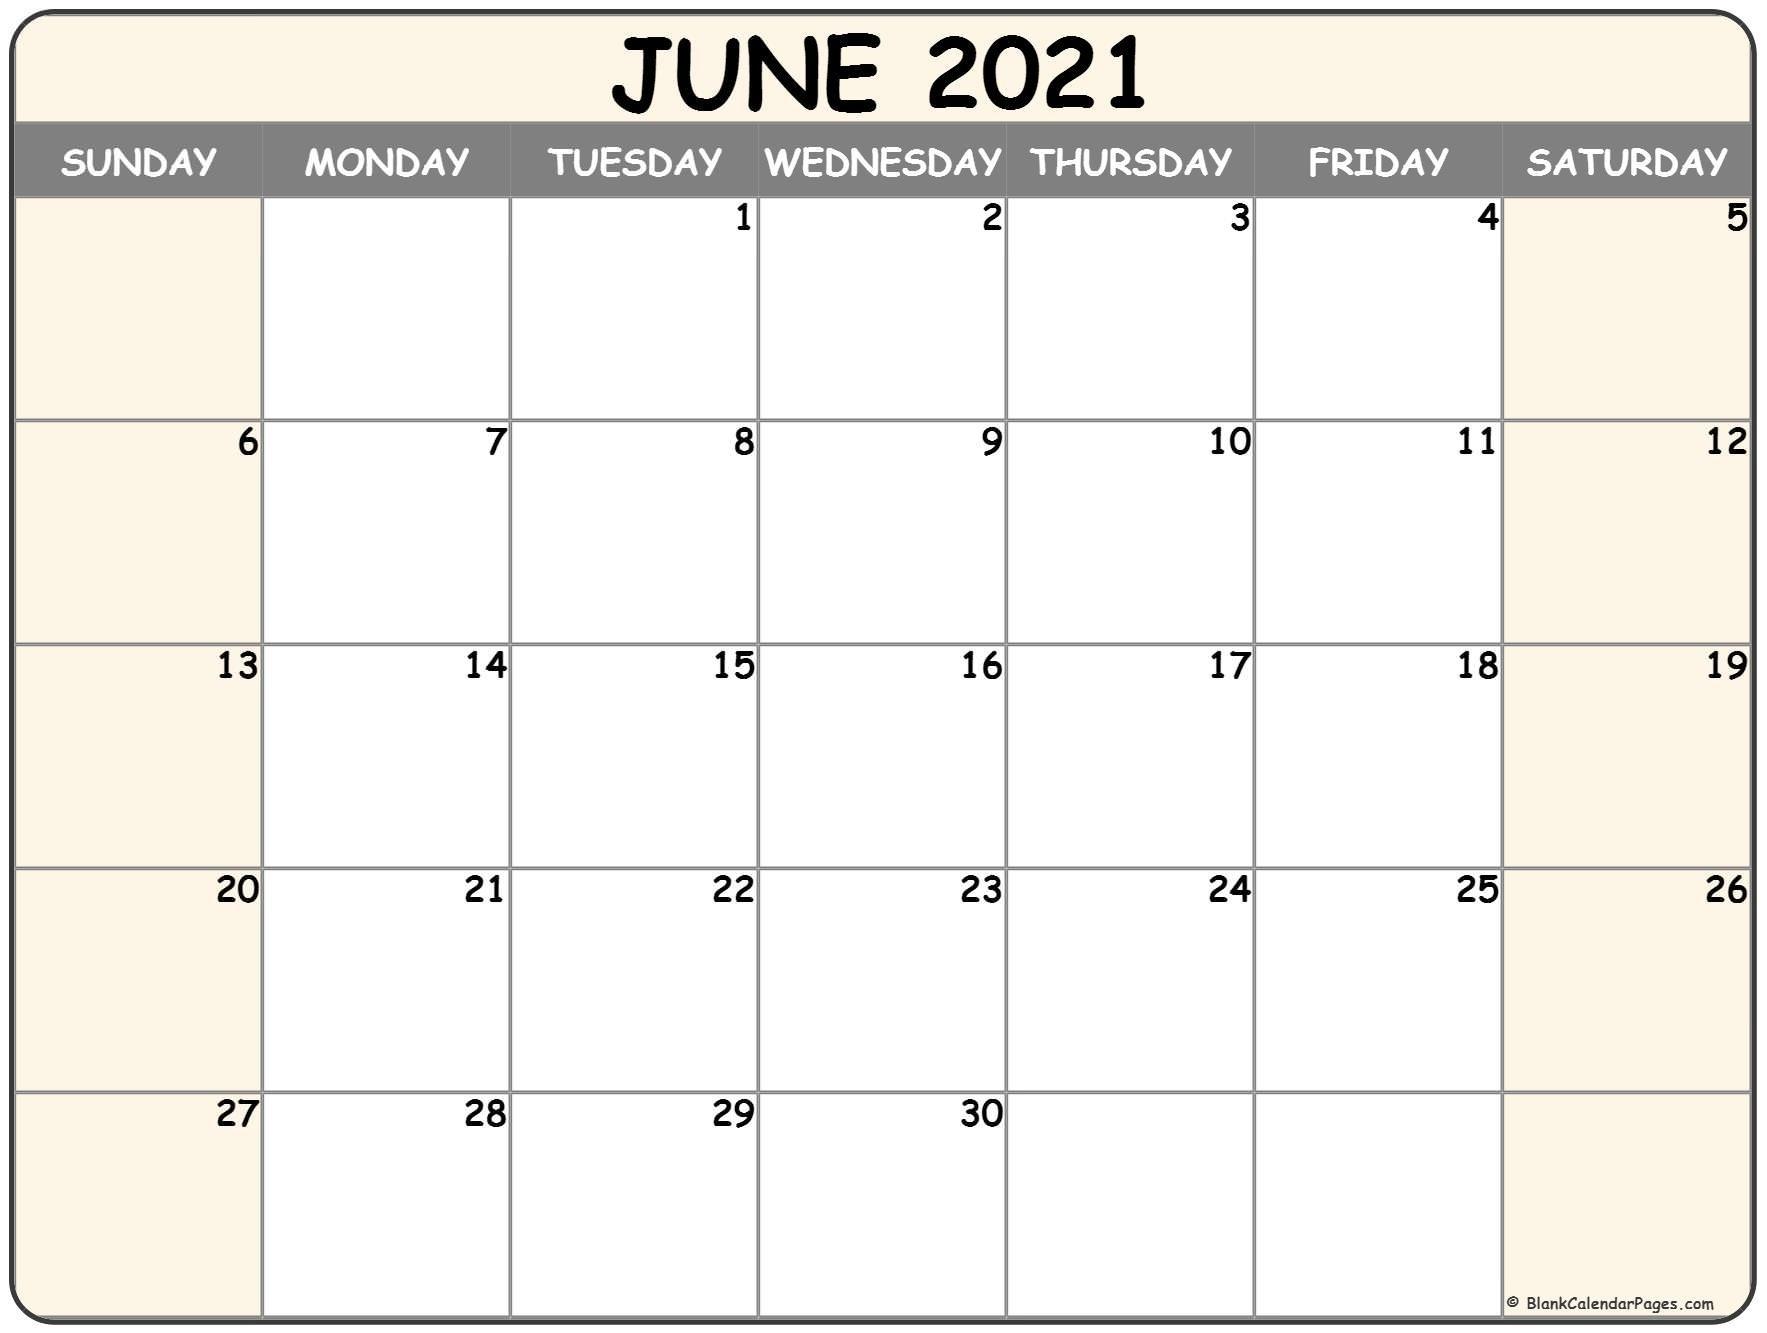 Sepetember 2021 Calendar With Big Numbers   Calendar Template Printable June 2021 Blank Calendar Printable